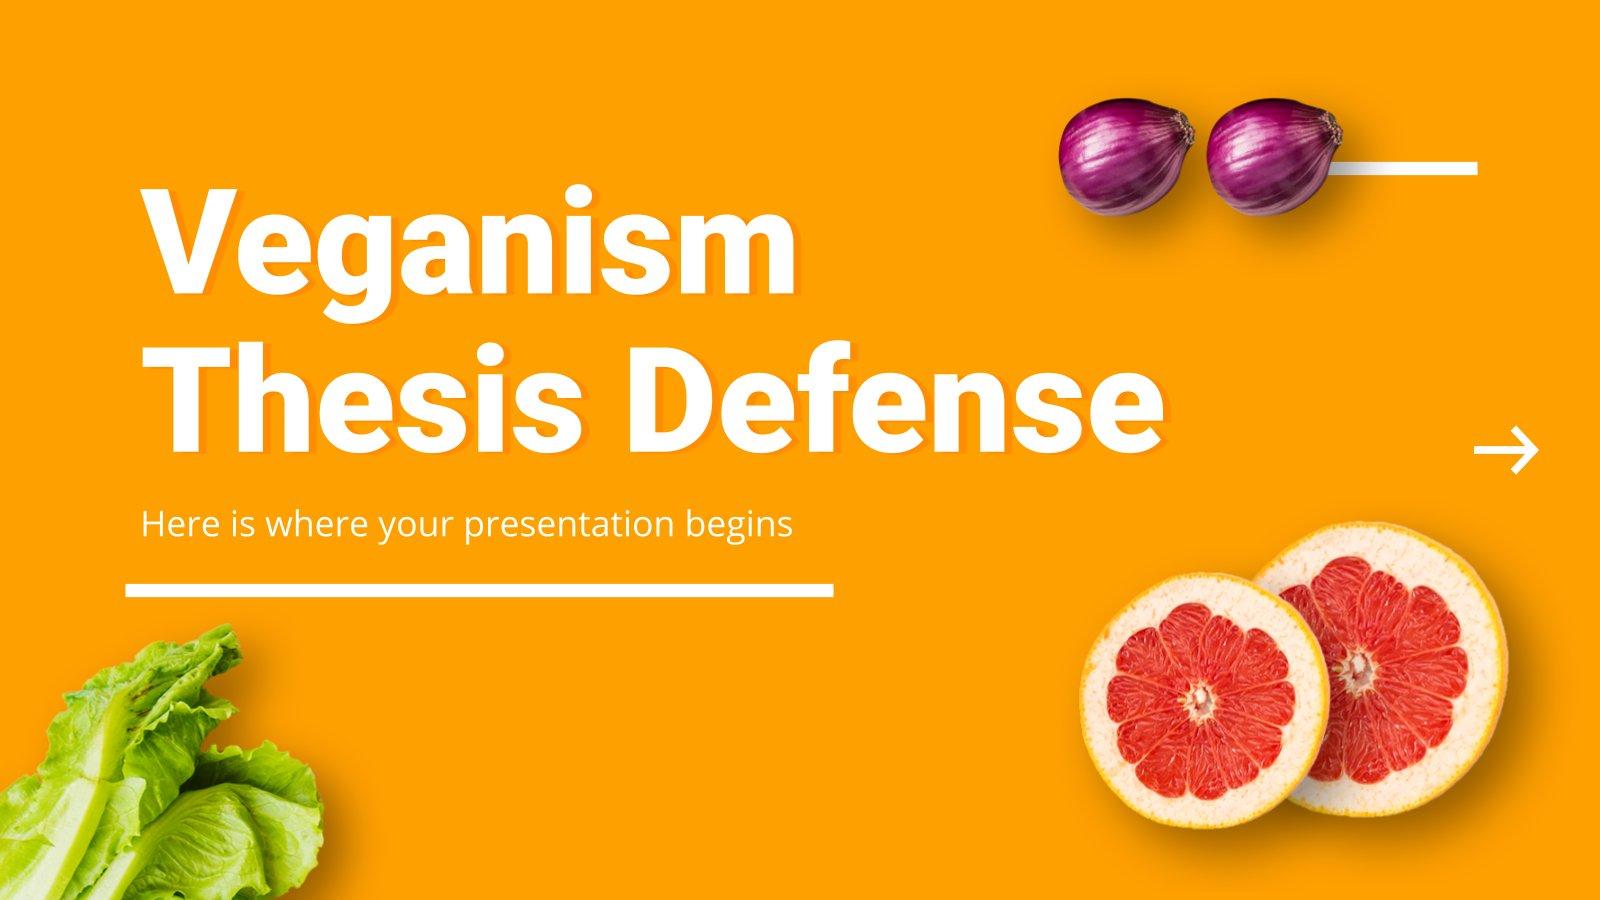 Veganism Thesis Defense presentation template